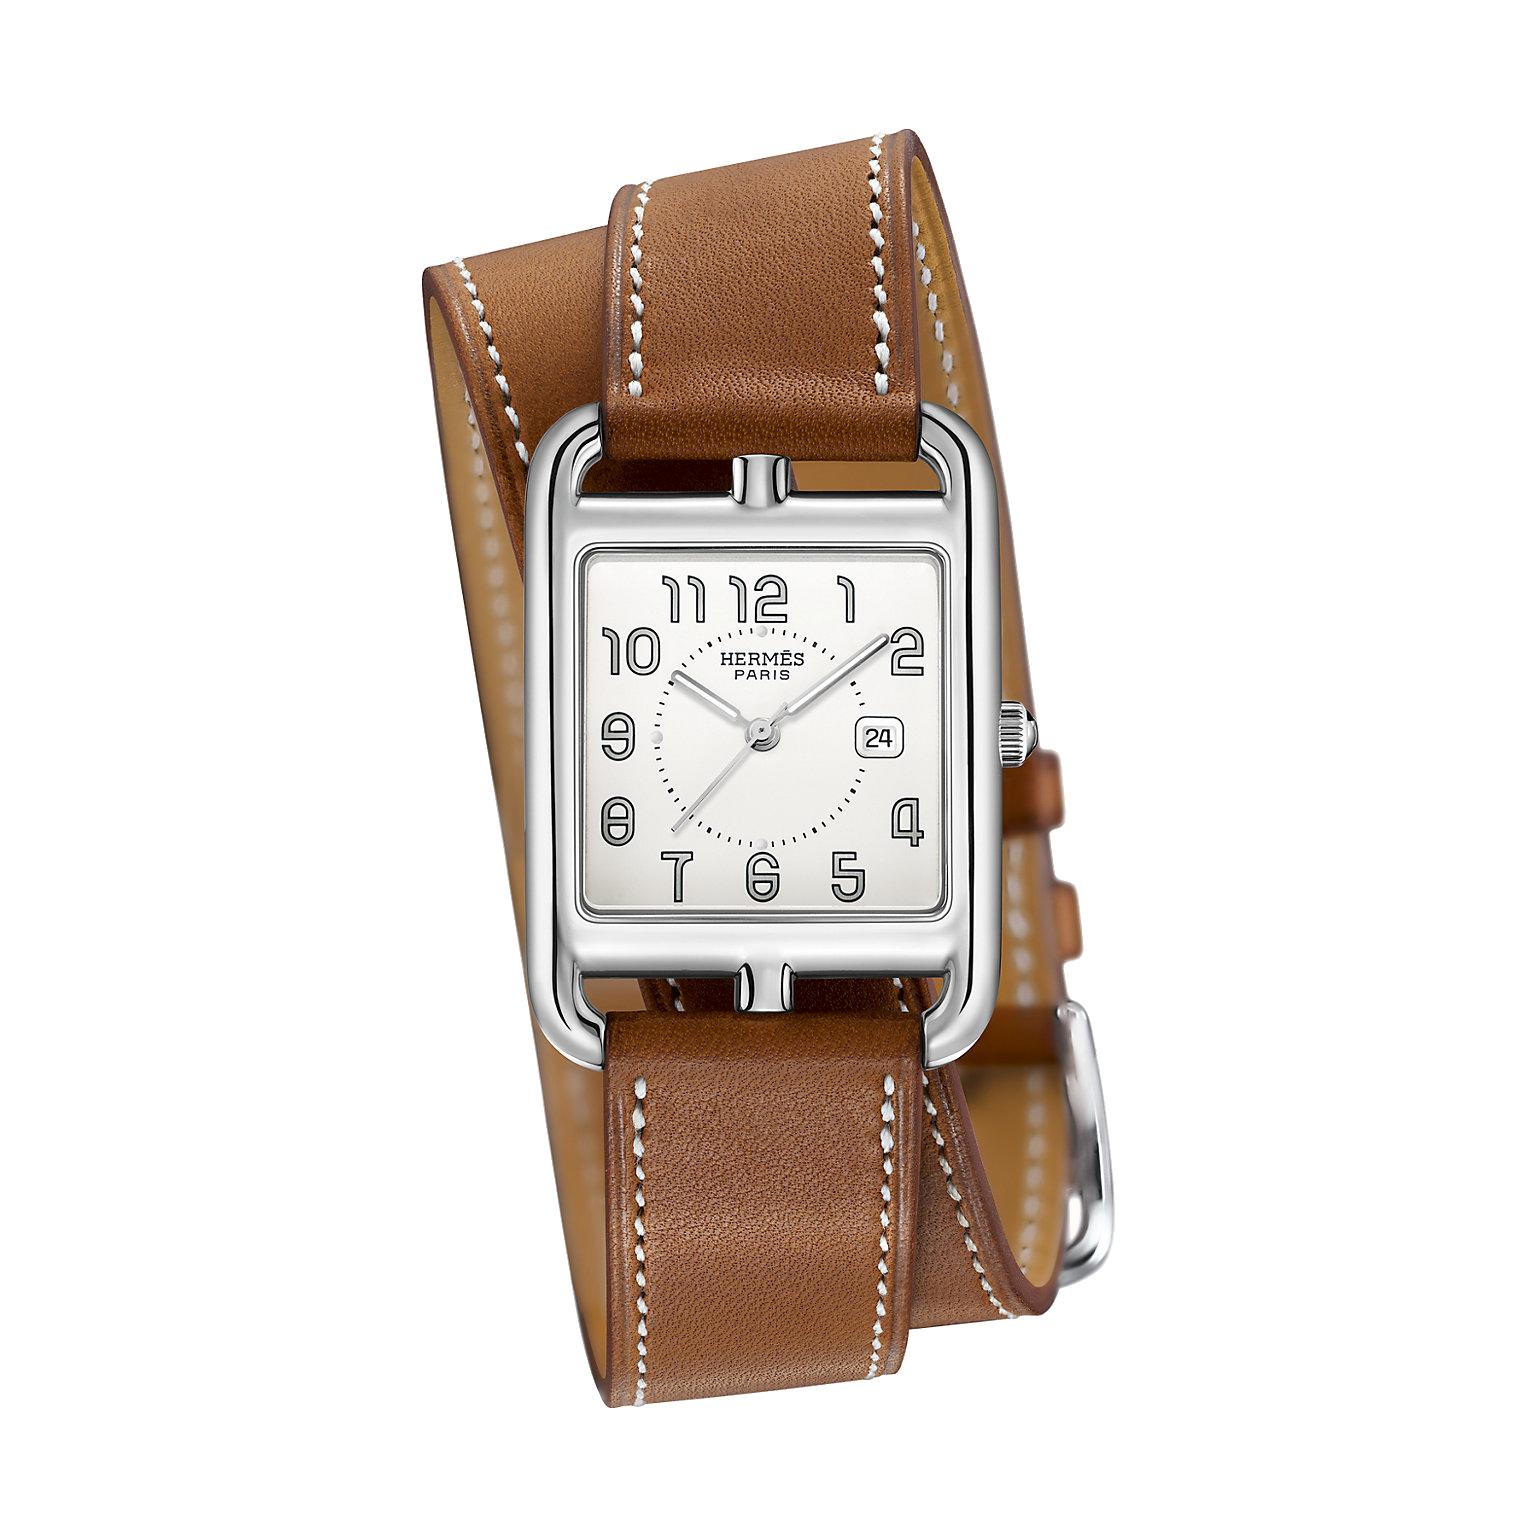 Hermès-cape-cod-29-x-29mm-Hall-of-Time-043653WW00